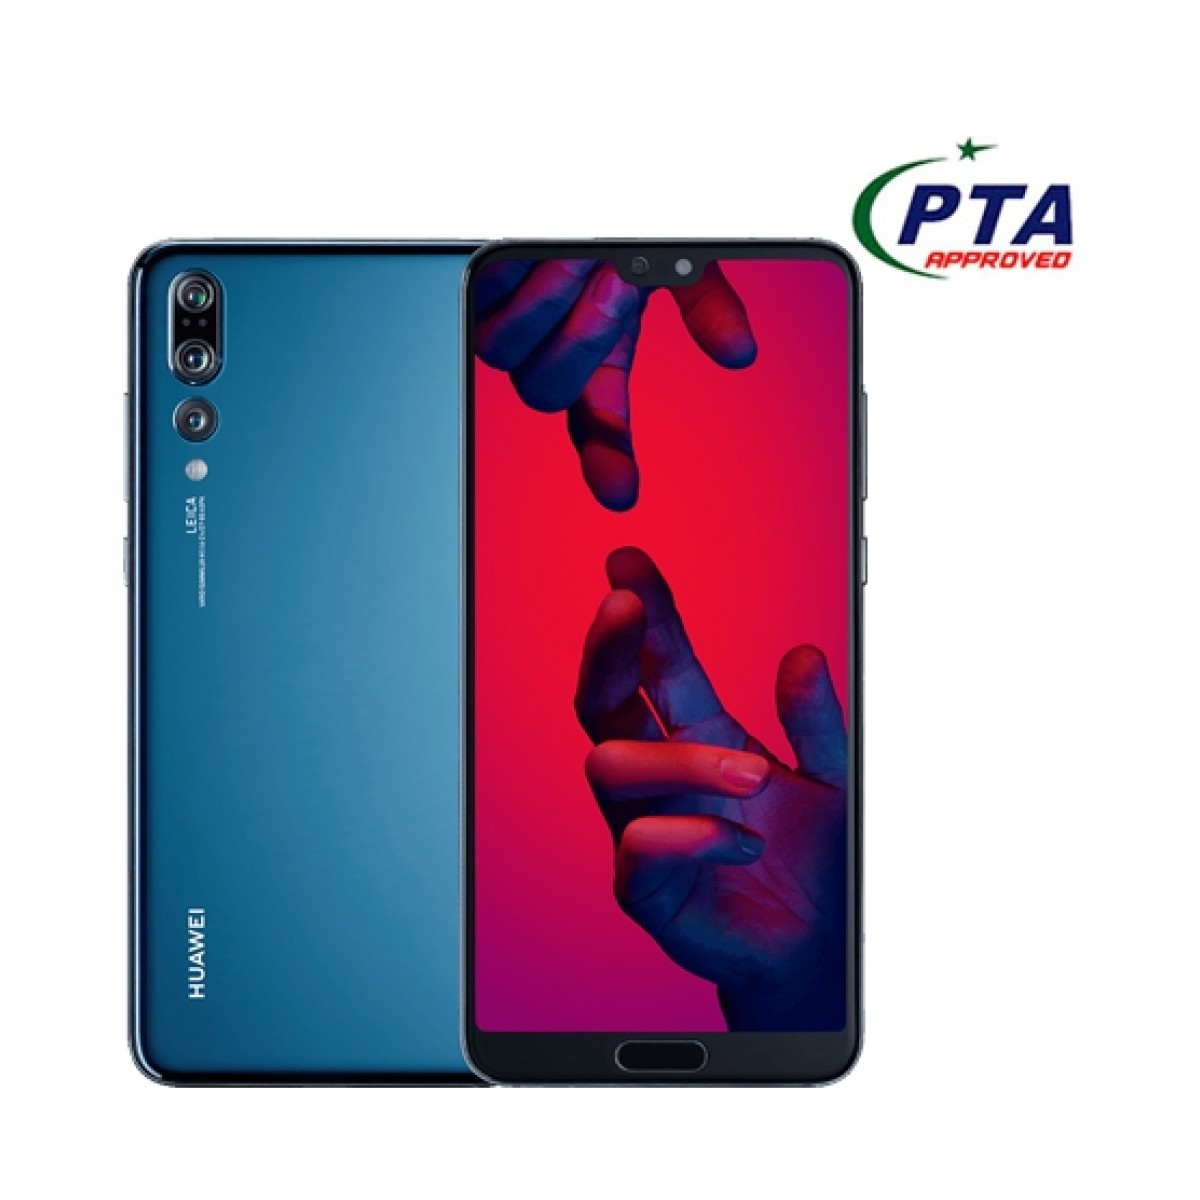 Huawei P20 Pro 128GB Dual Sim Midnight Blue